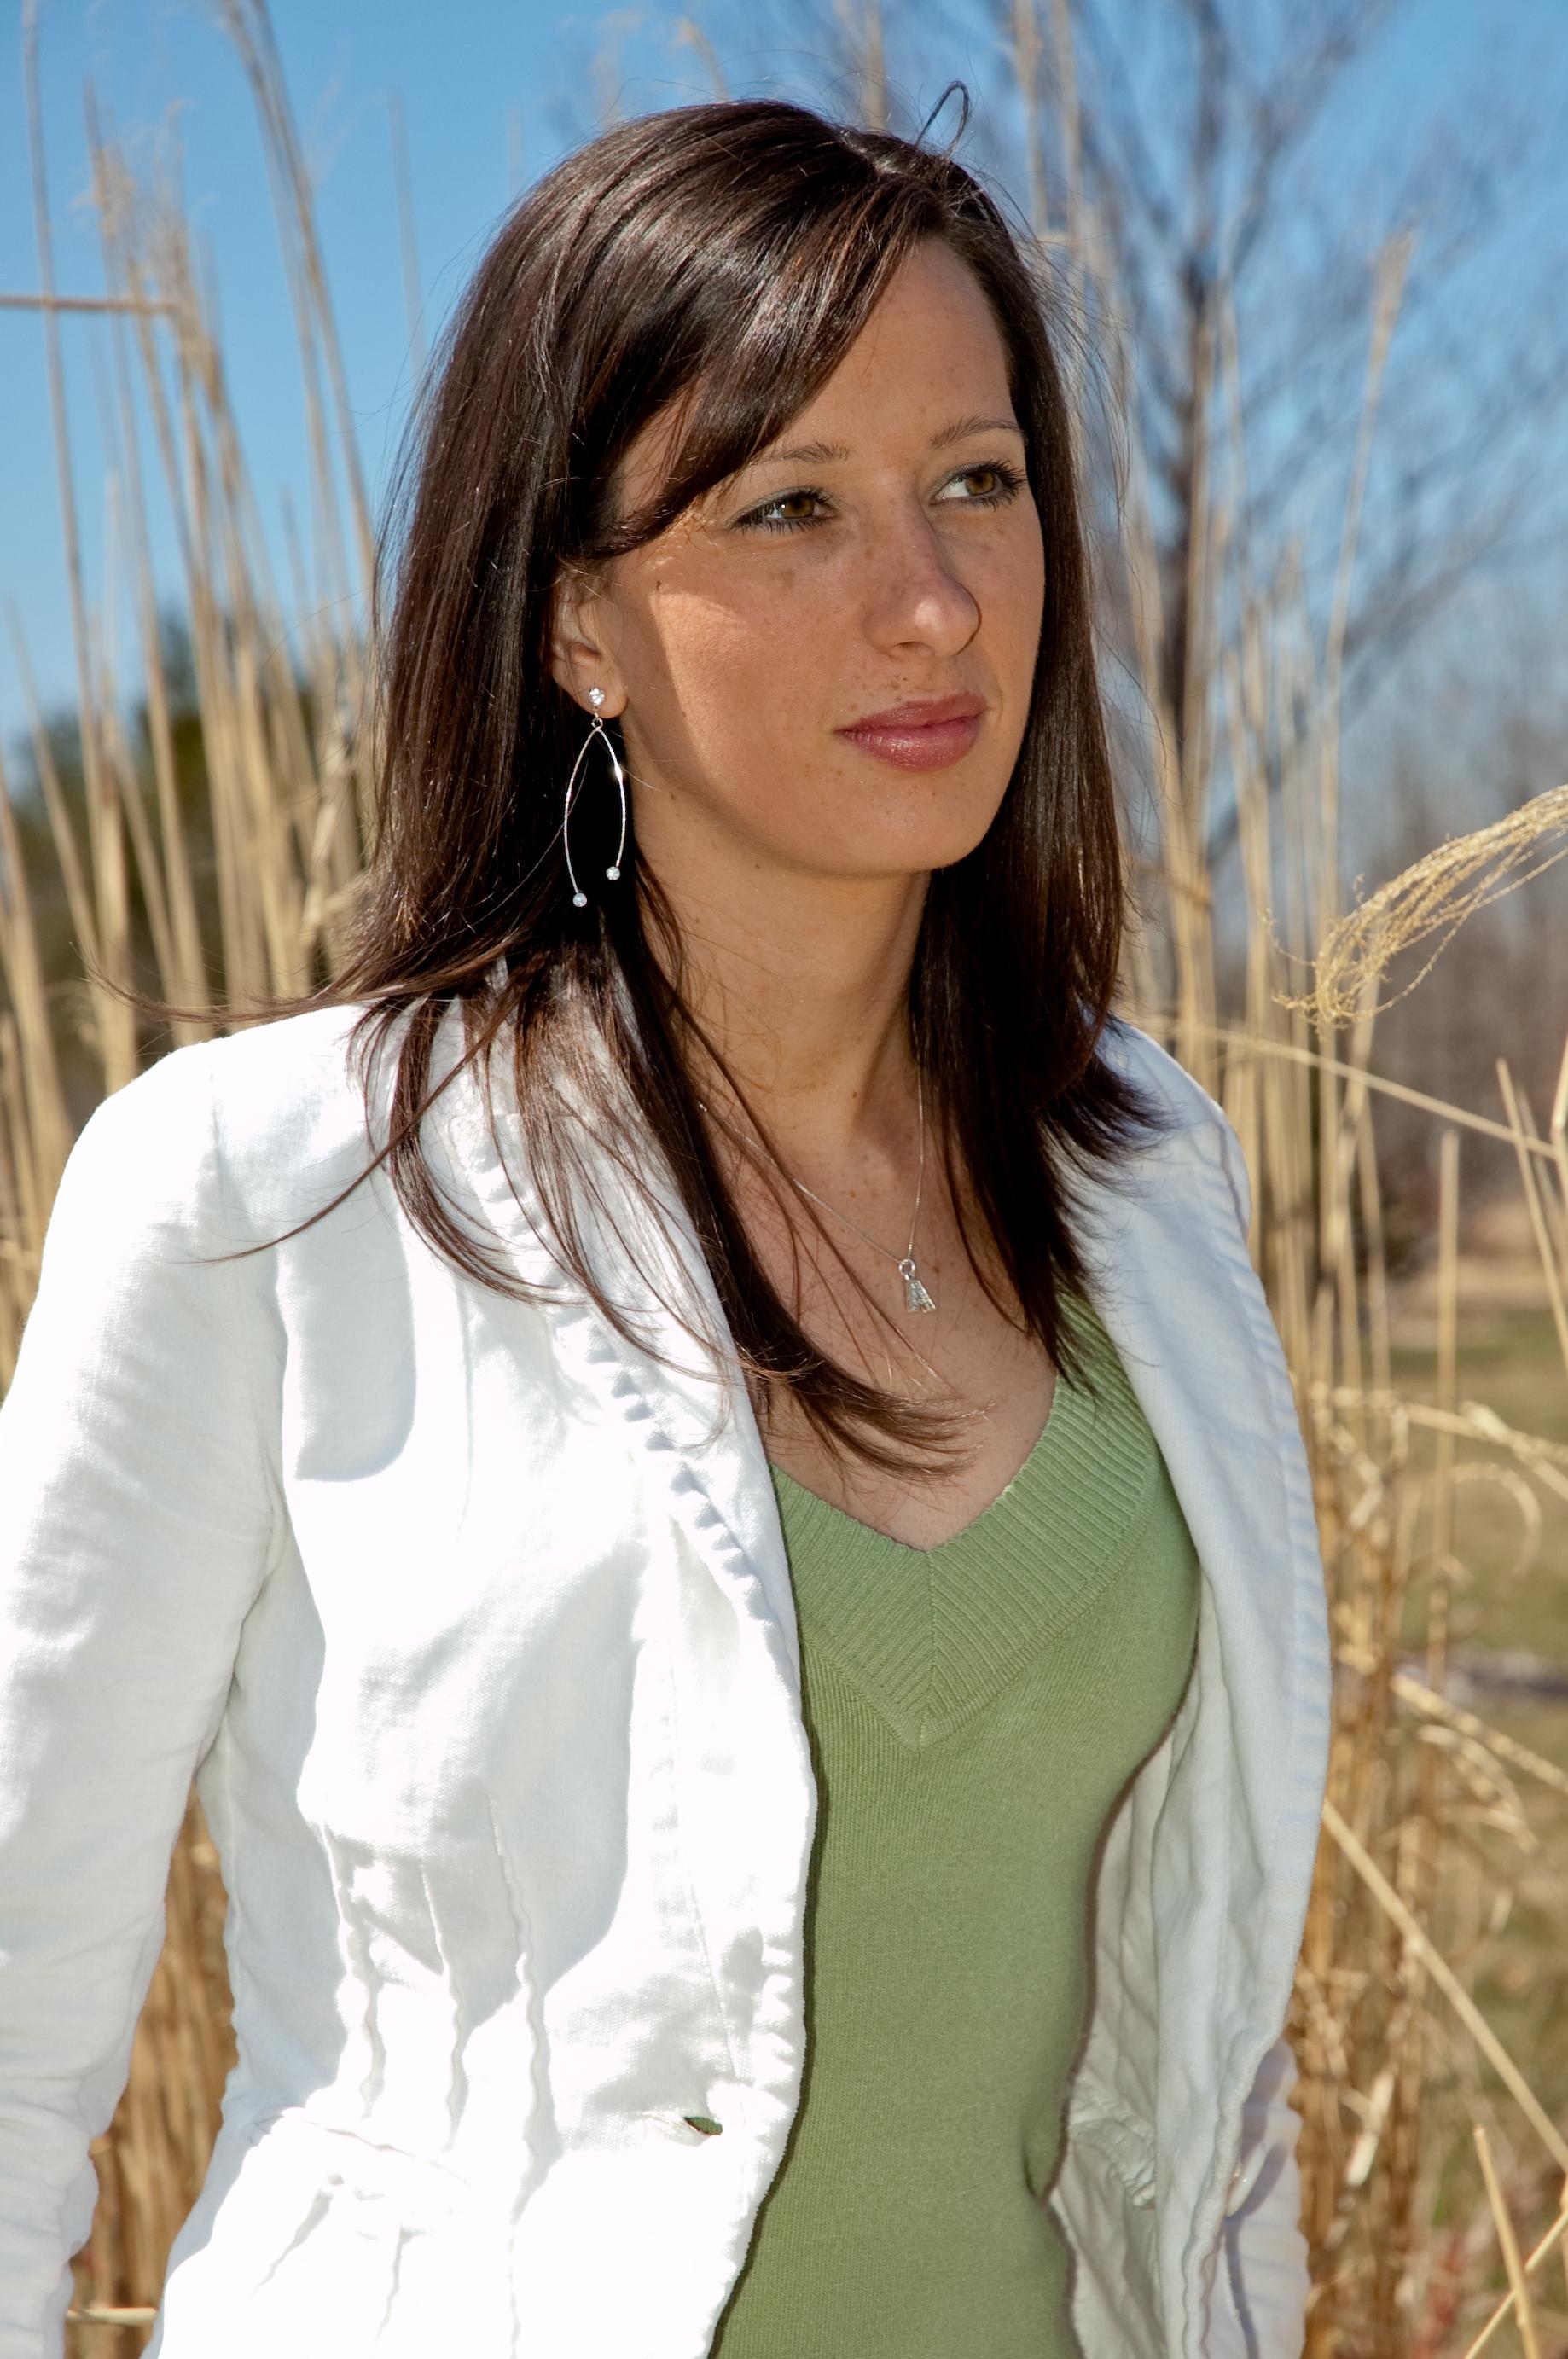 AmandaFerguson_20060408_2284.jpg